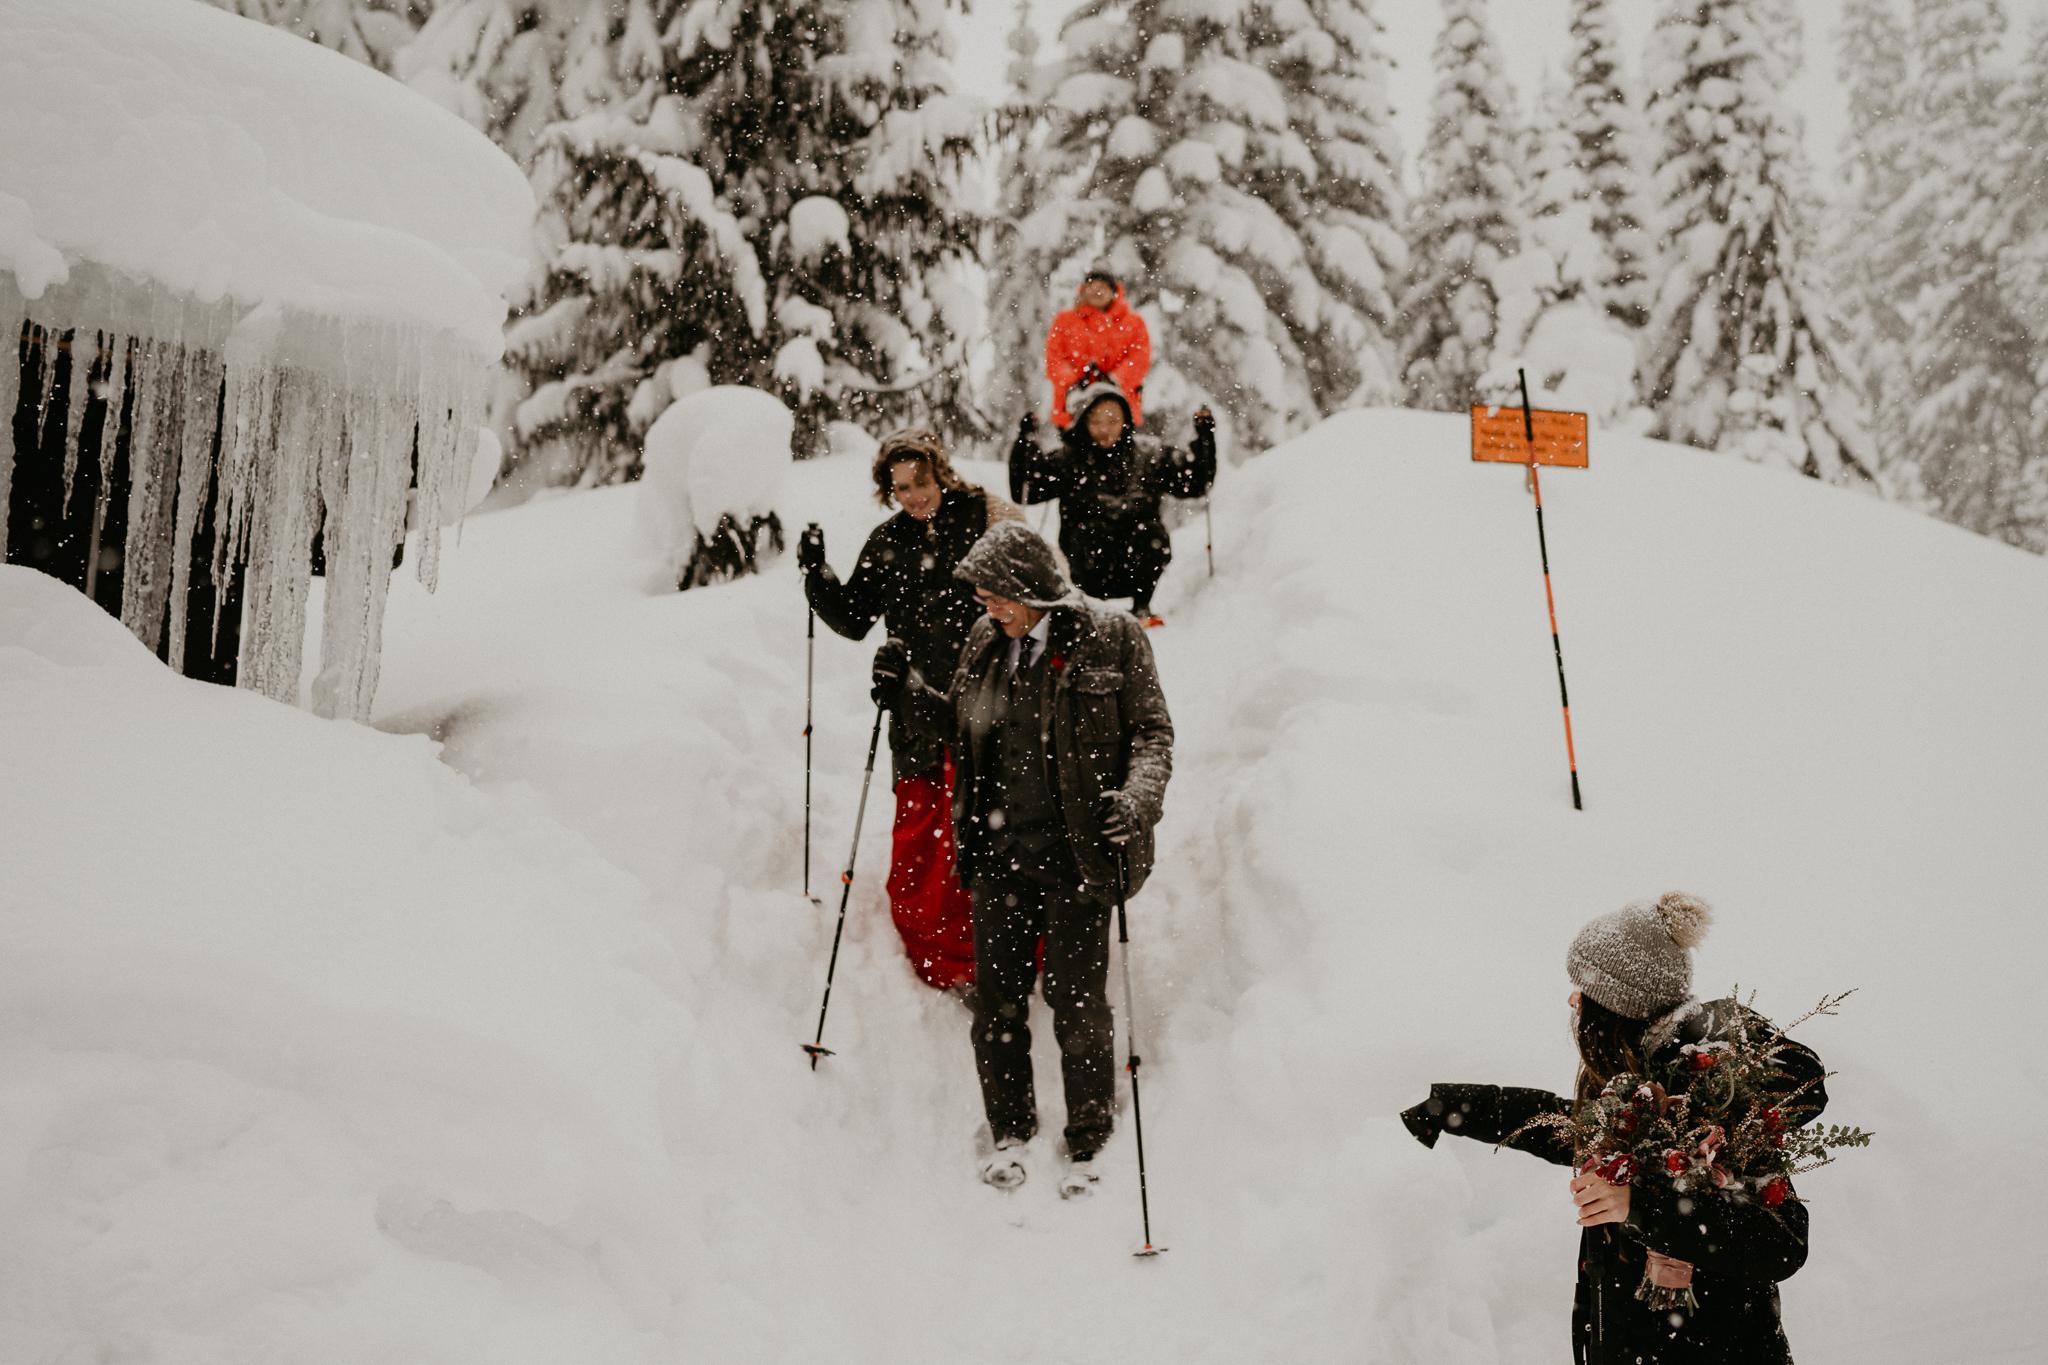 Mount-Rainier-Snow-Winter-Elopement-Adventure-Photographer2-75.jpg